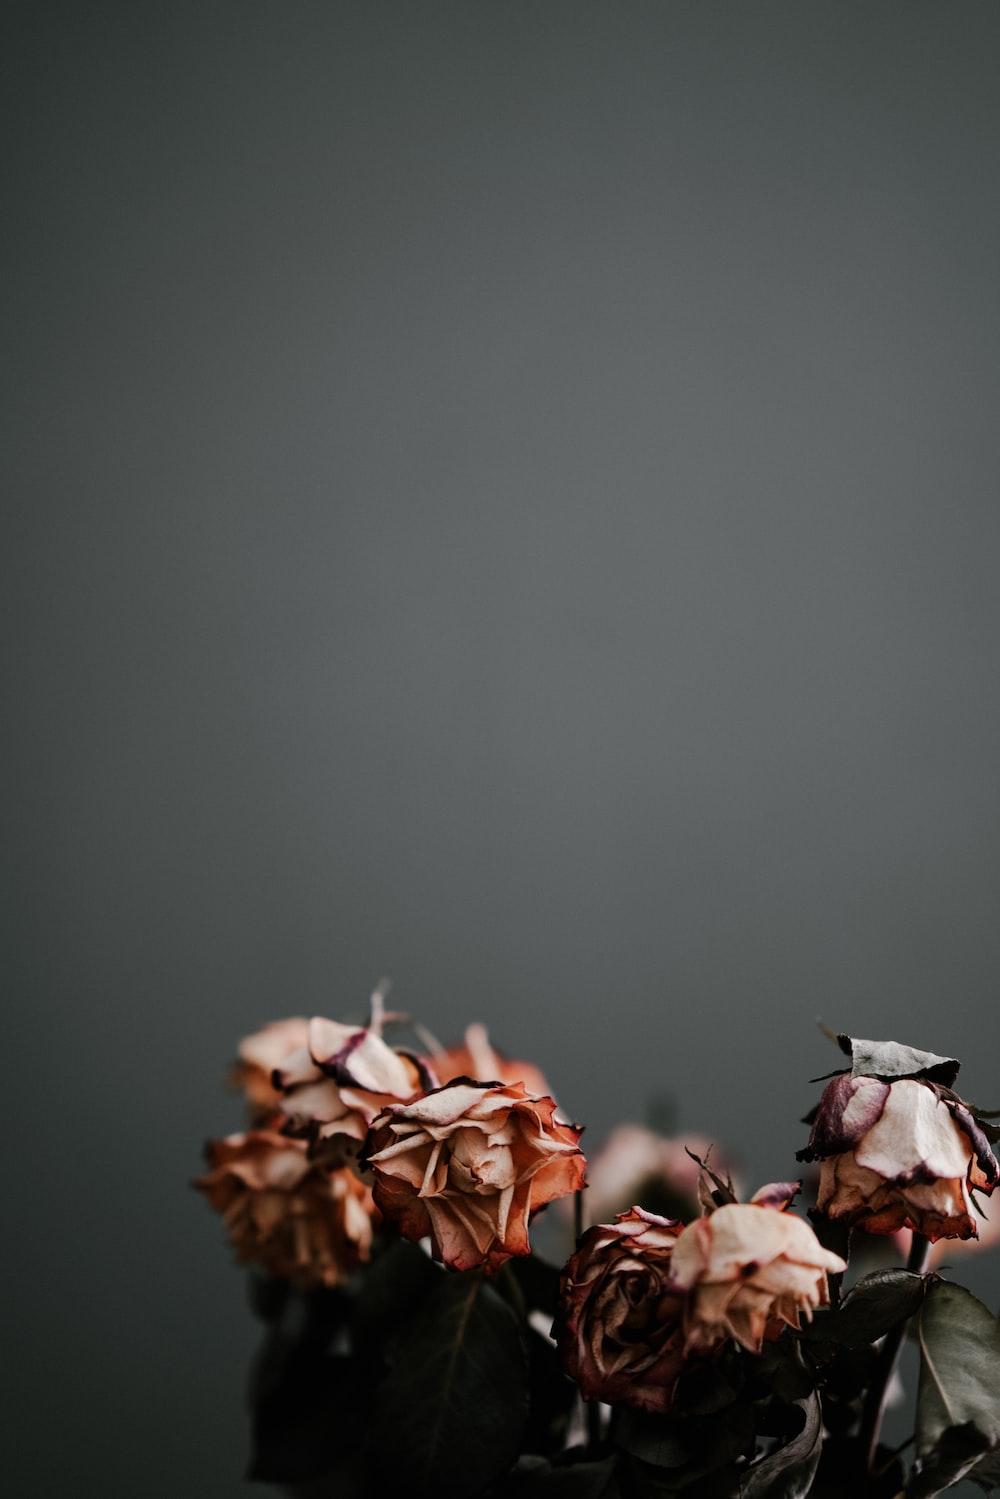 dry beige flower